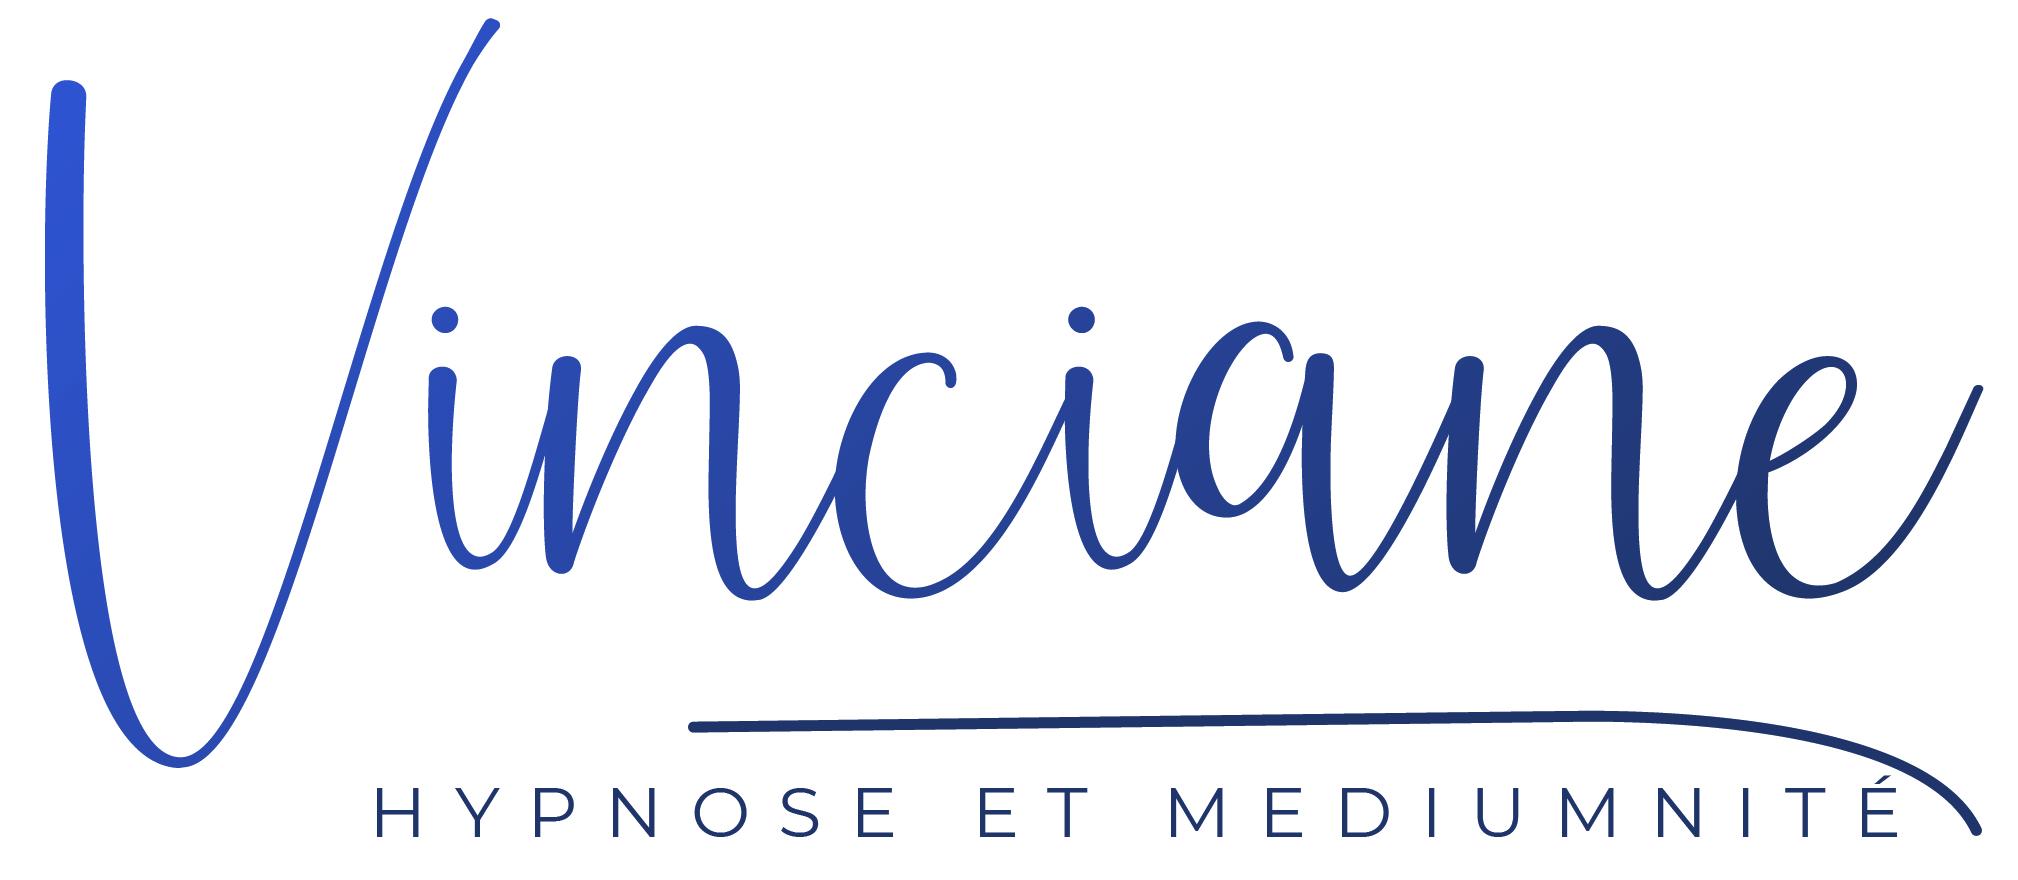 creation logo hypnose